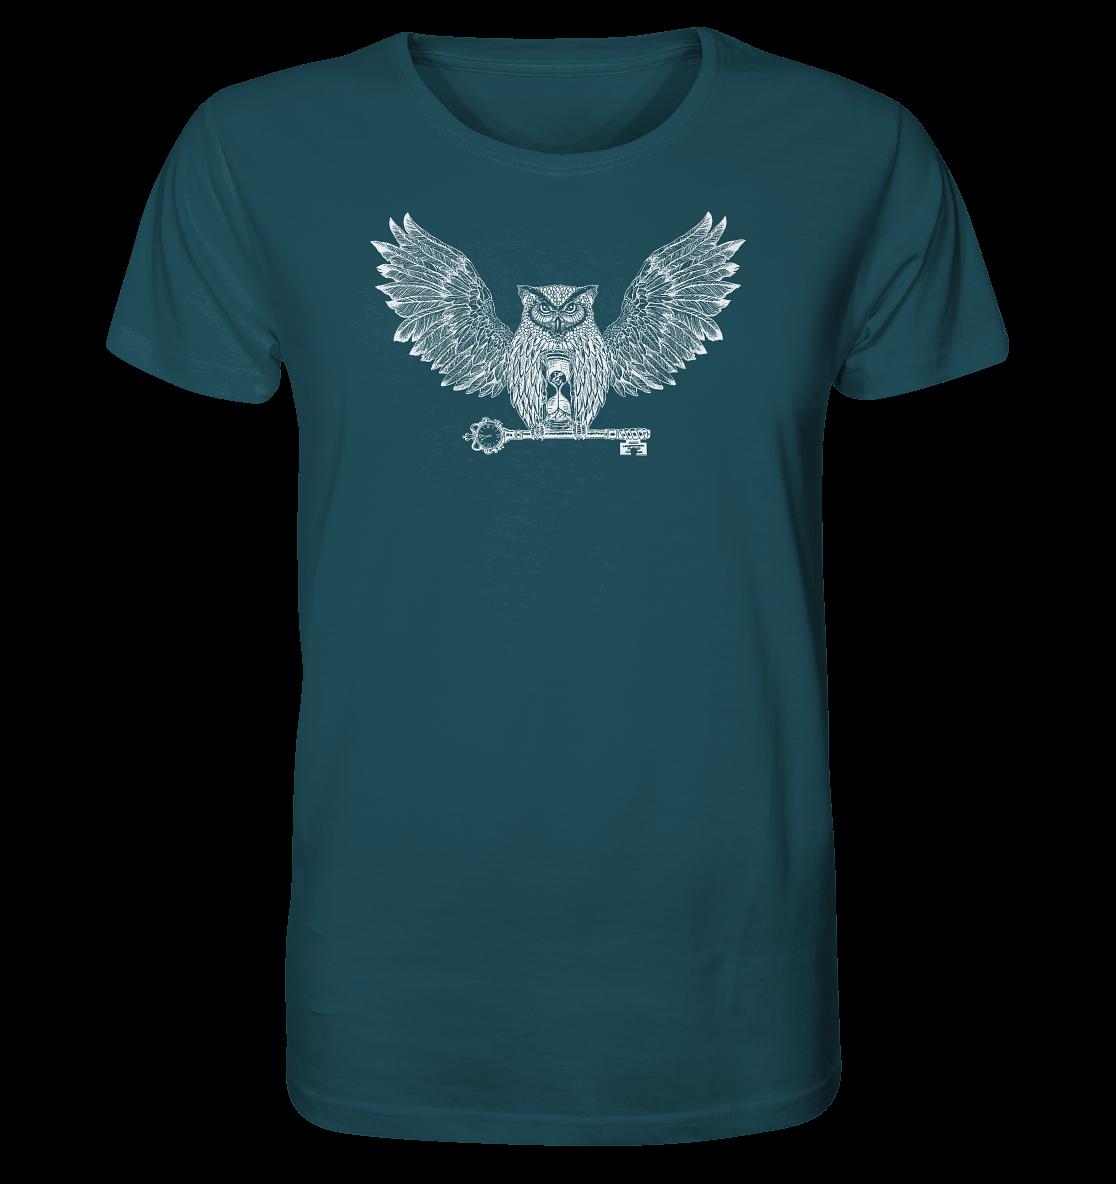 front-organic-shirt-204d59-1116x-4.png